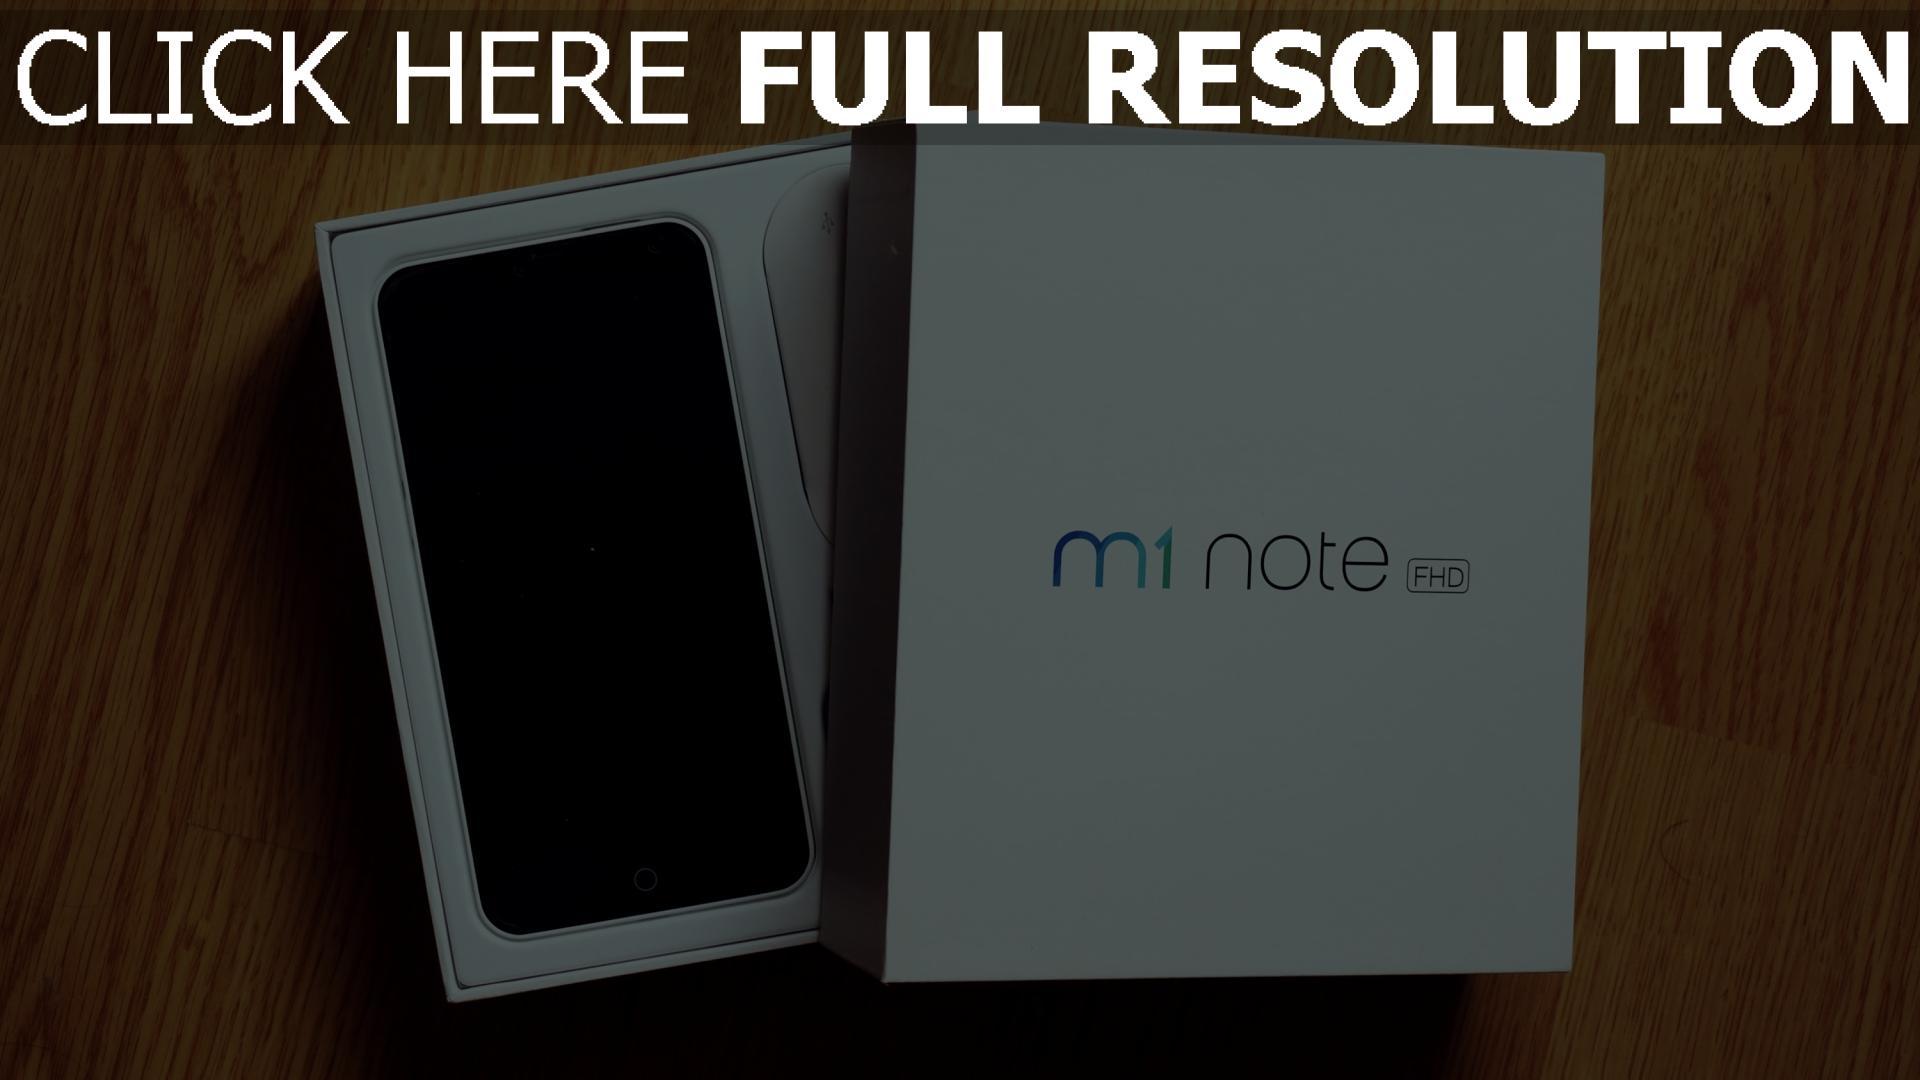 hd hintergrundbilder m1 note smartphone meizu 1920x1080